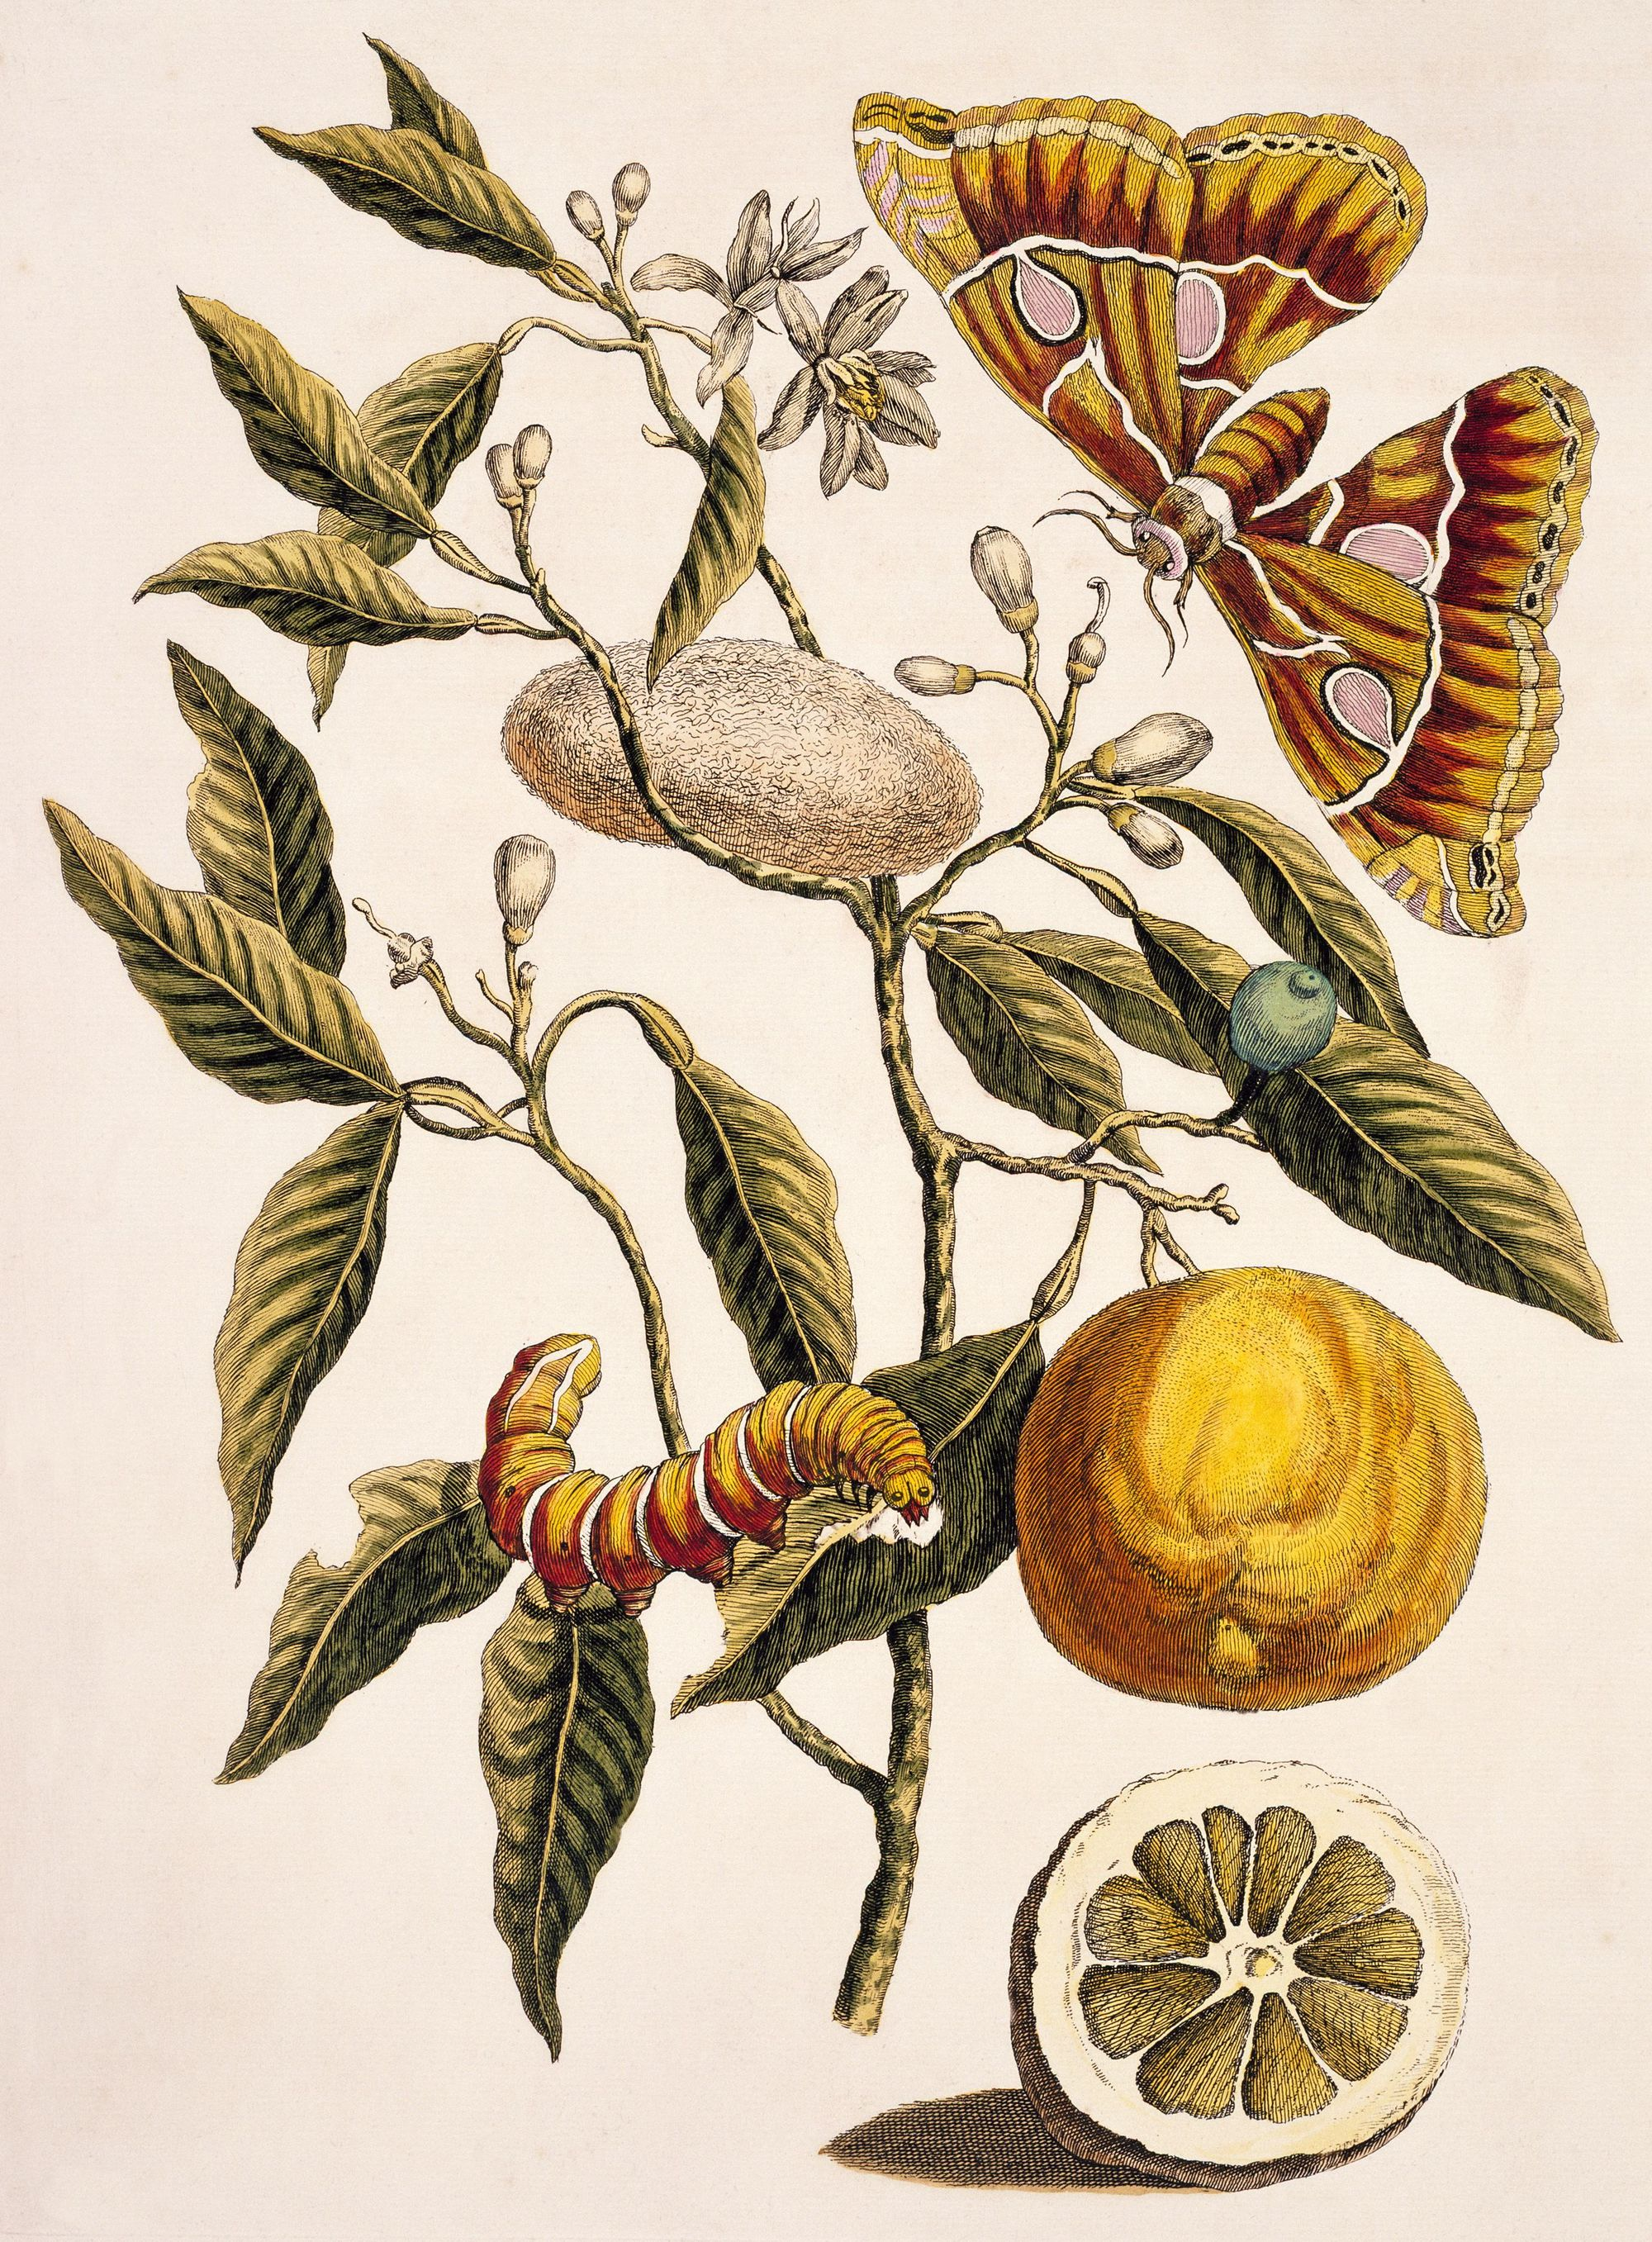 Maria Sibylla Merian, Metamorphosis insectorum Surinamensium, 1705, dessin